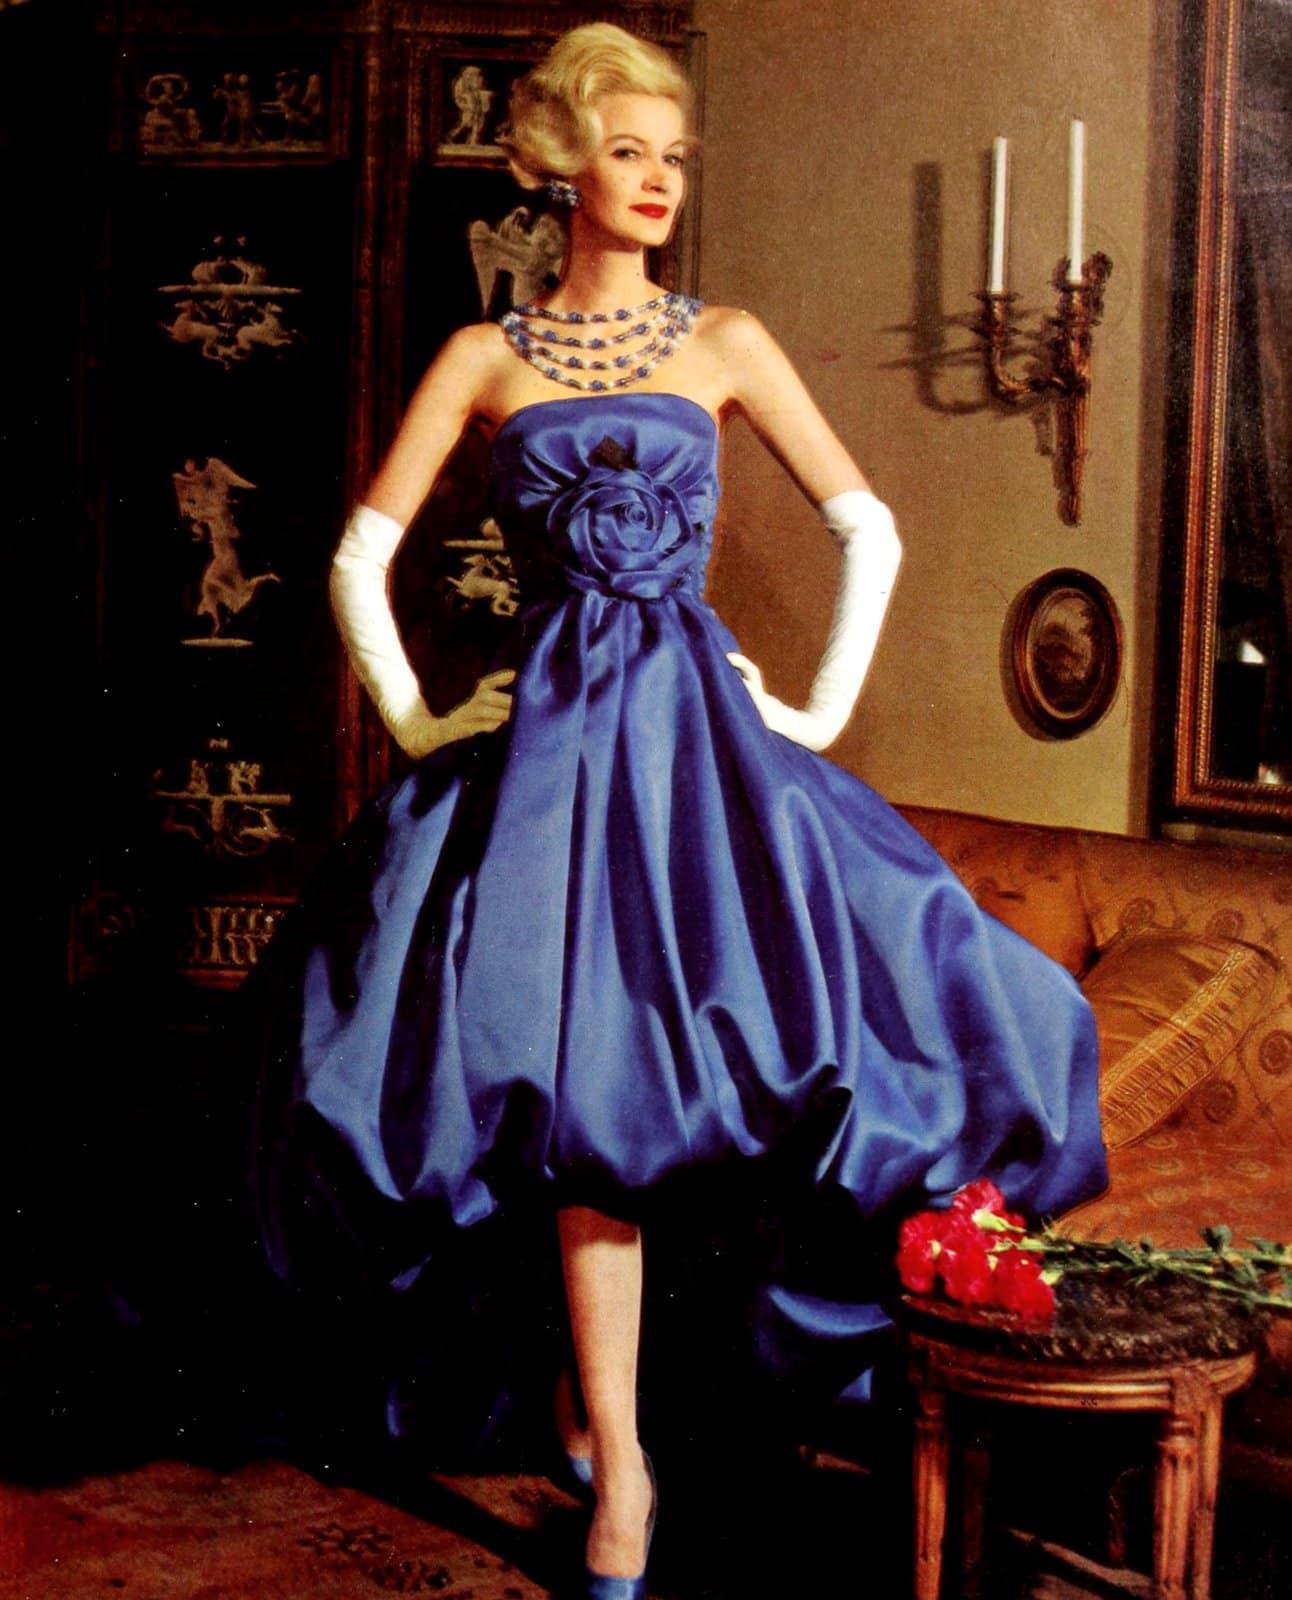 Gloves add a dash of elegance (1950s)